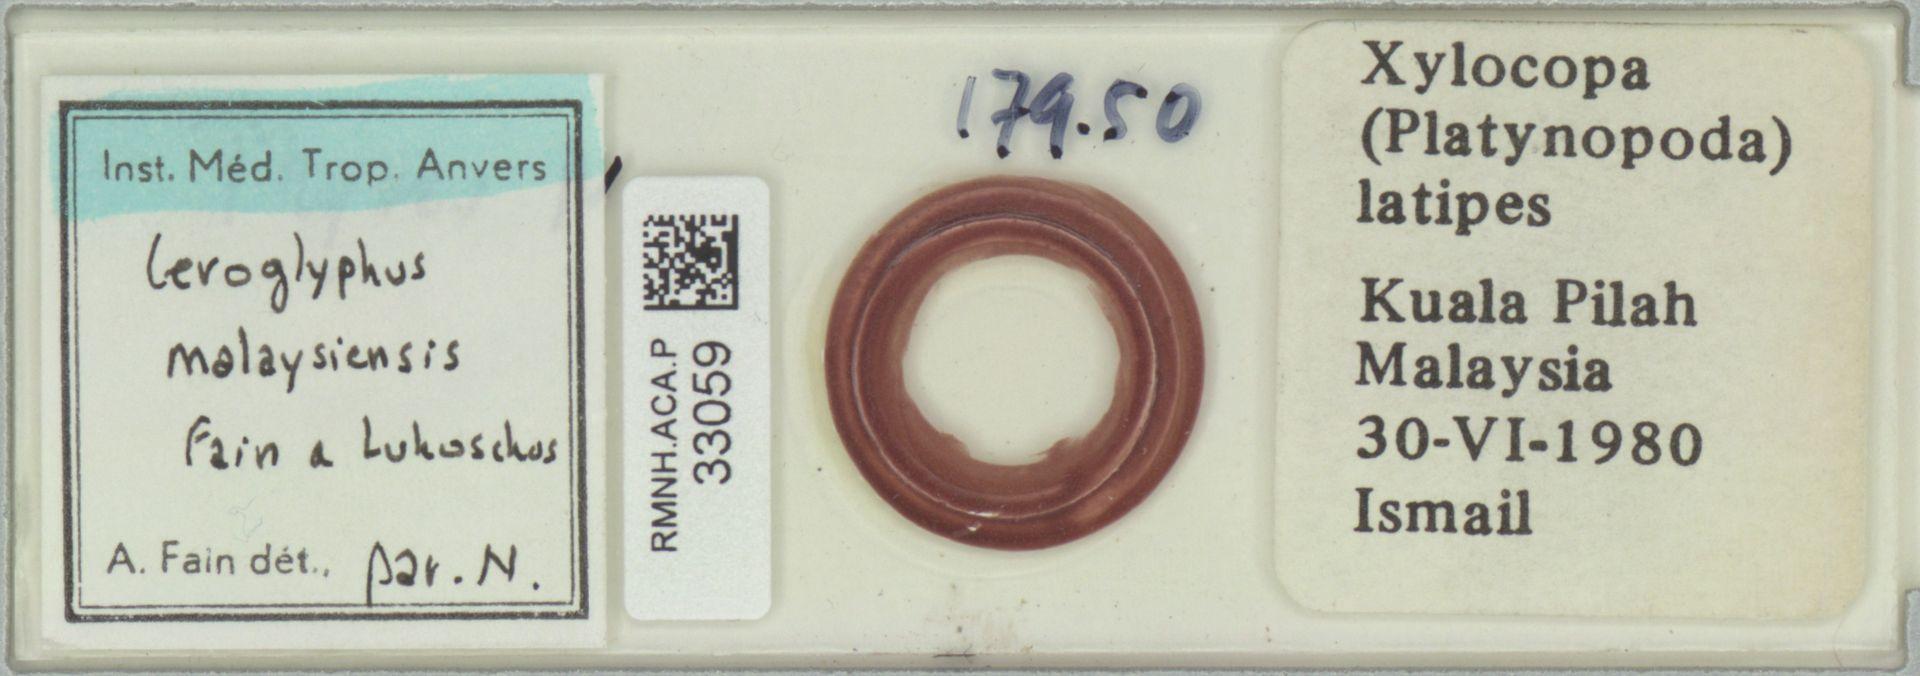 RMNH.ACA.P.33059 | Ceroglyphus malaysiensis Fain & Lukoschus